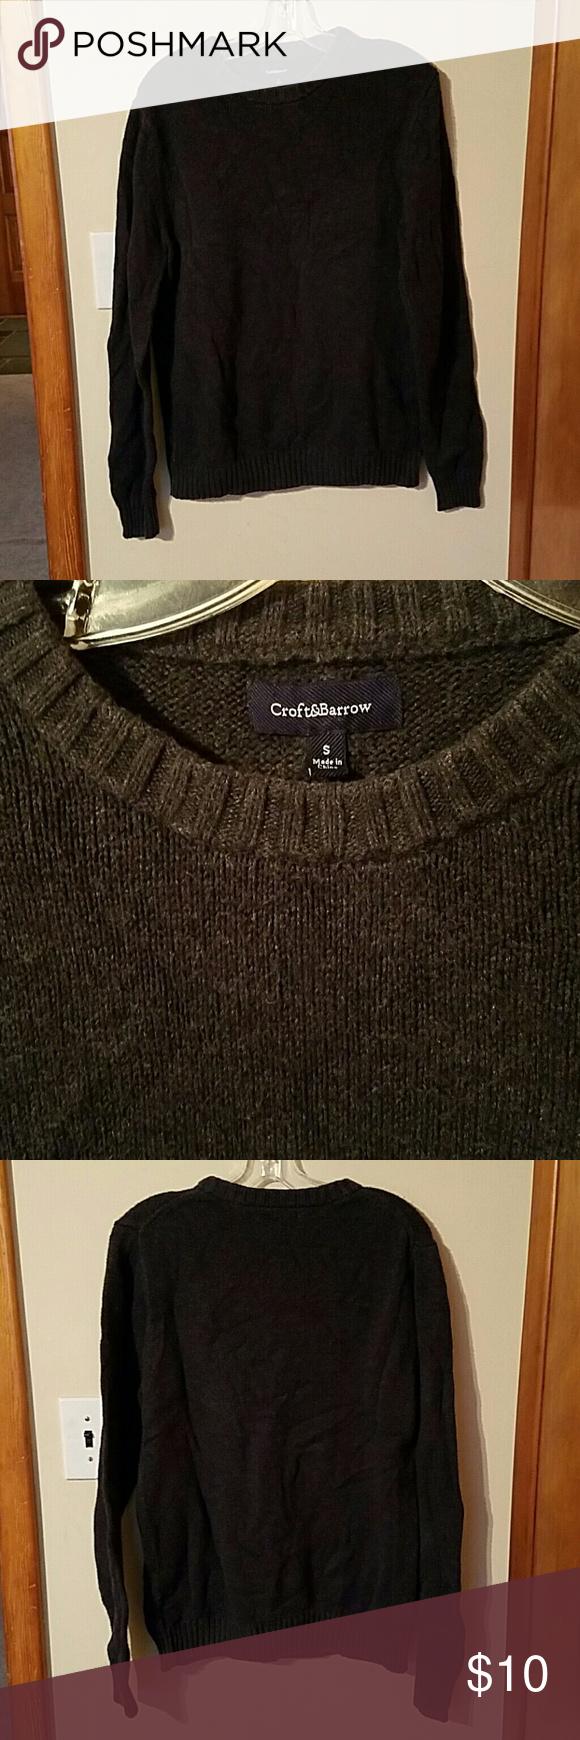 Menus Croft and Barrow Sweater Small GRAY Size small gray Croft